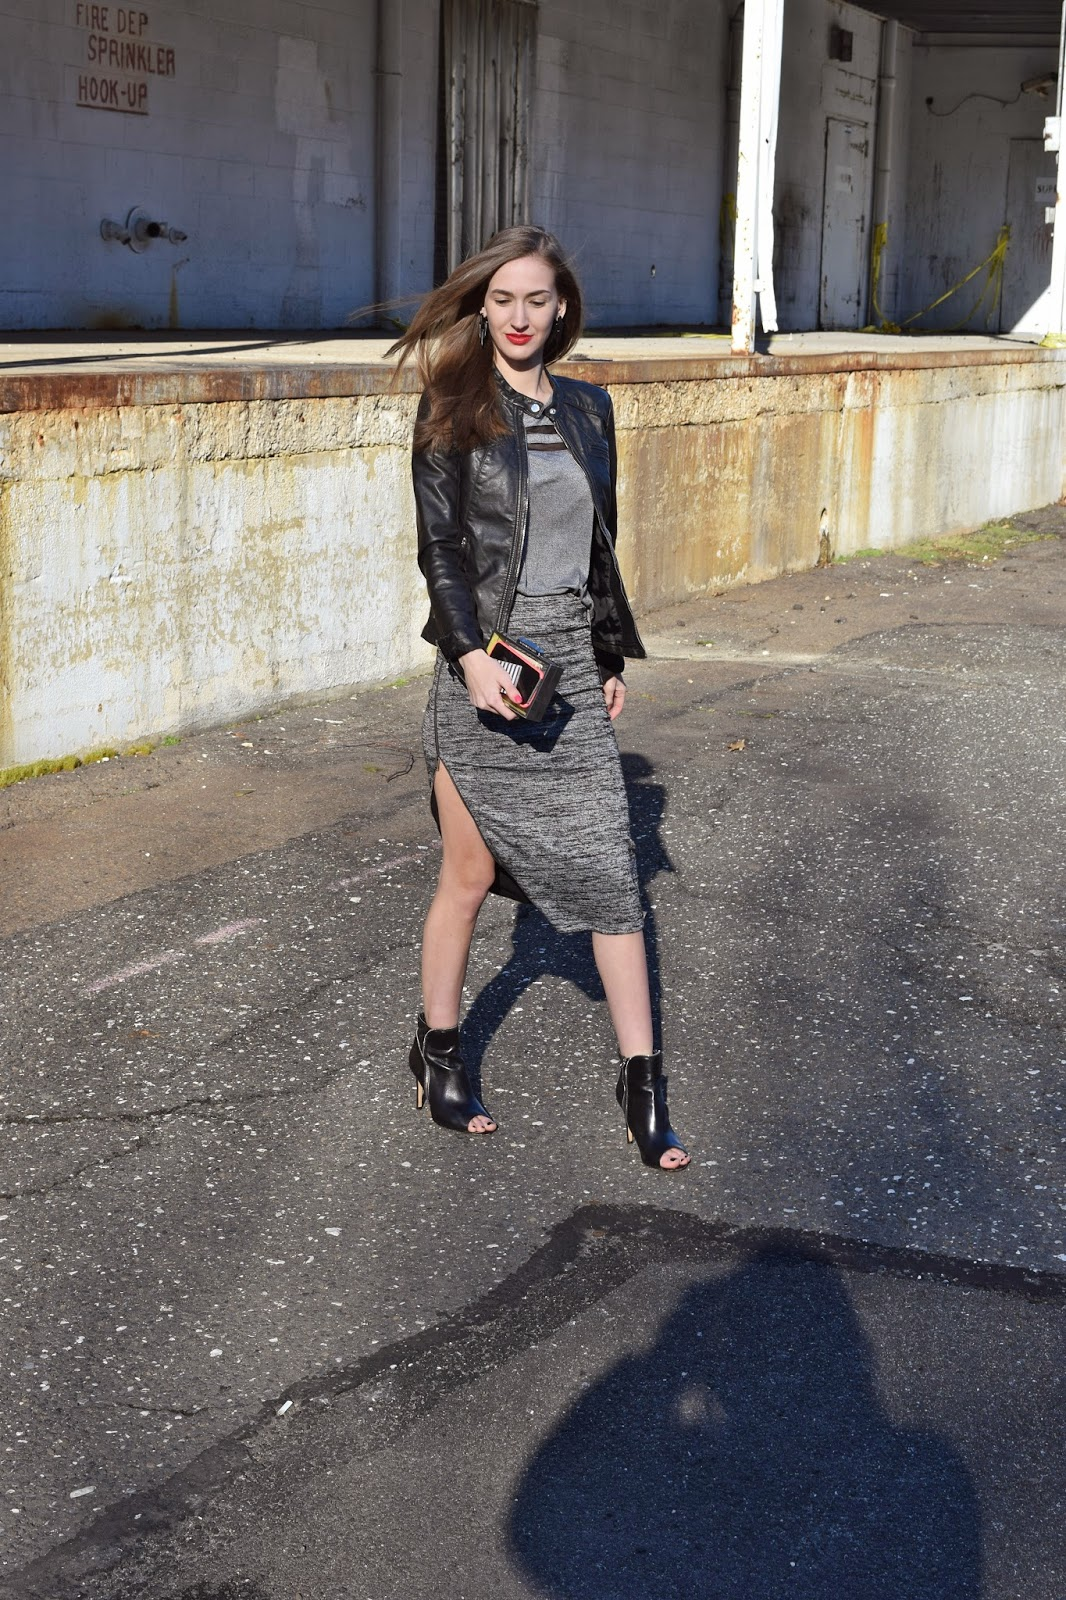 wearing Express faux leather moto jacket, H&M Varsity mesh t-shirt, Express side zip skirt, halogen ankle booties